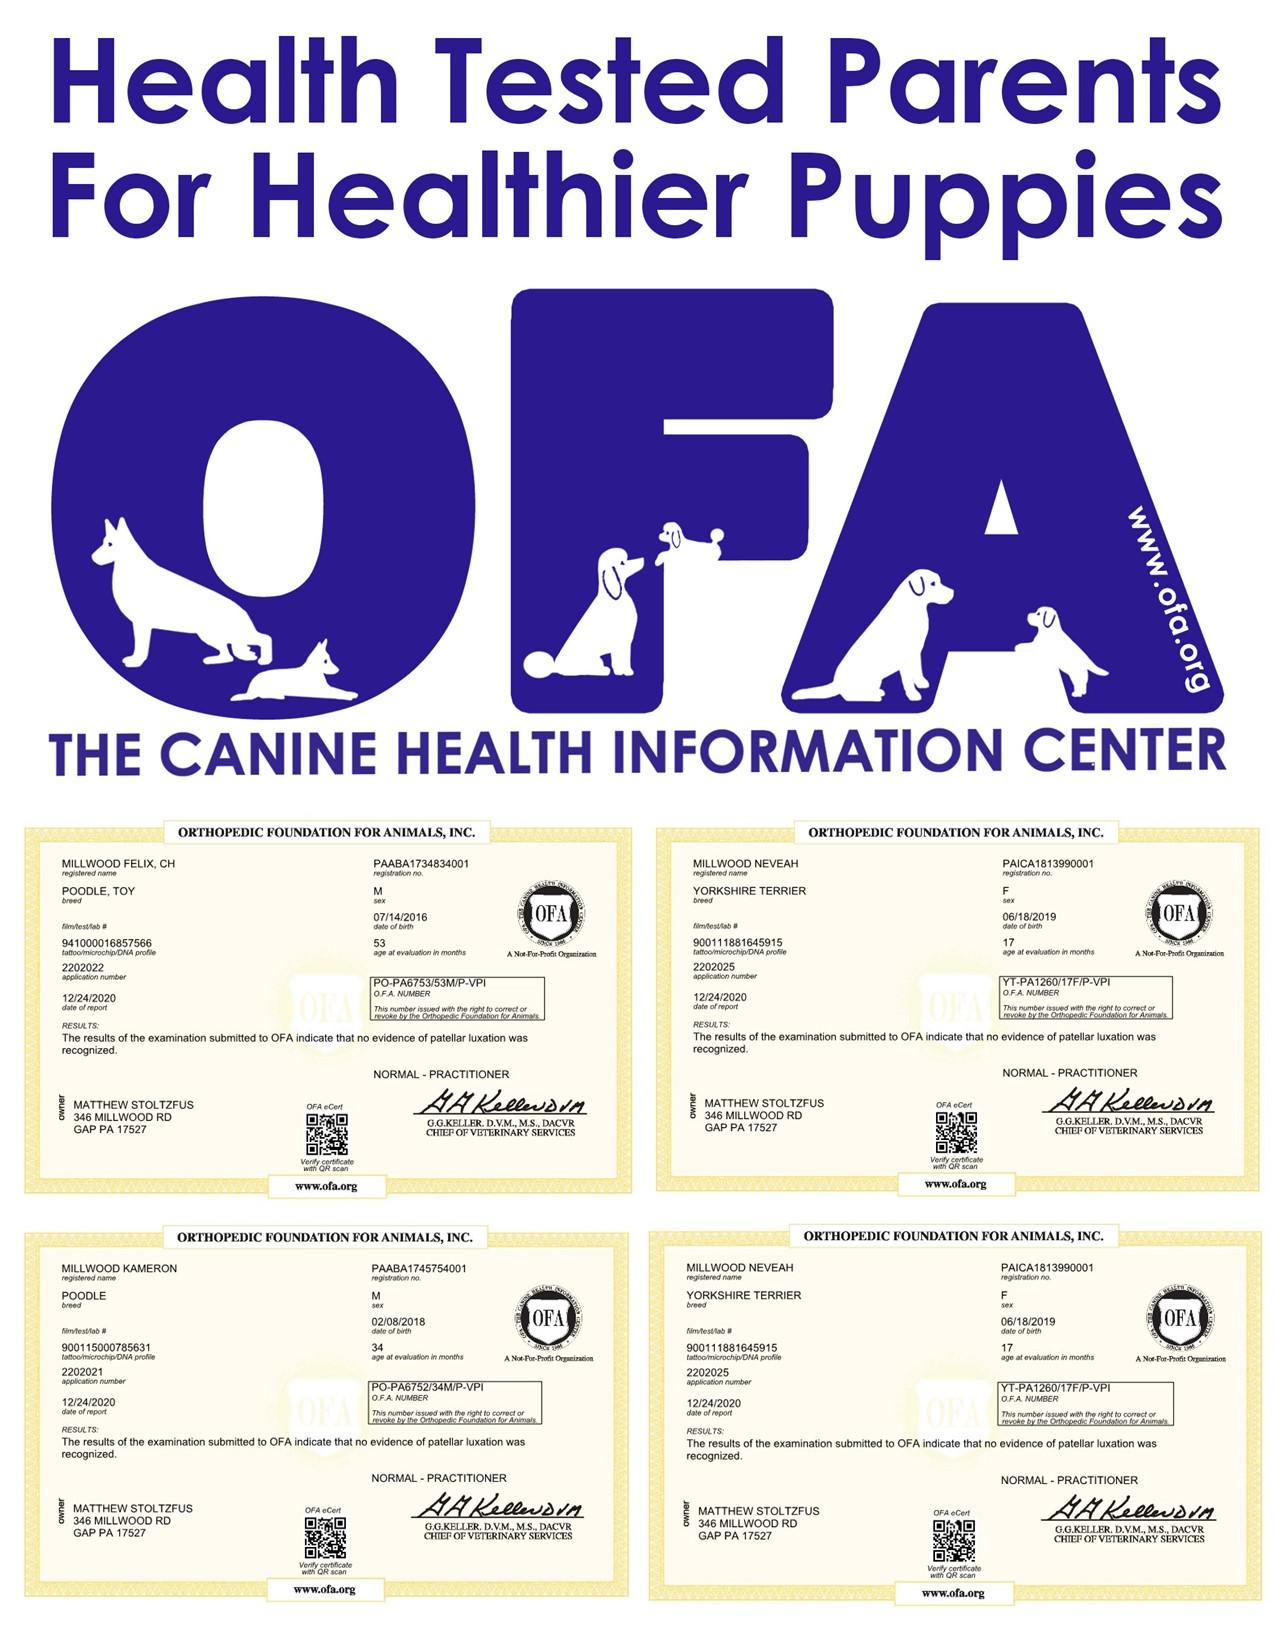 news, article, matthew, stoltzfus, dog, breeder, matthew-stoltzfus, dog-breeder, starbreeder, dog-breeder, gap, pa, pennsylvnia, aphis, inspection, record, grey, hound, greyhound, puppy, mill, puppymill, usda